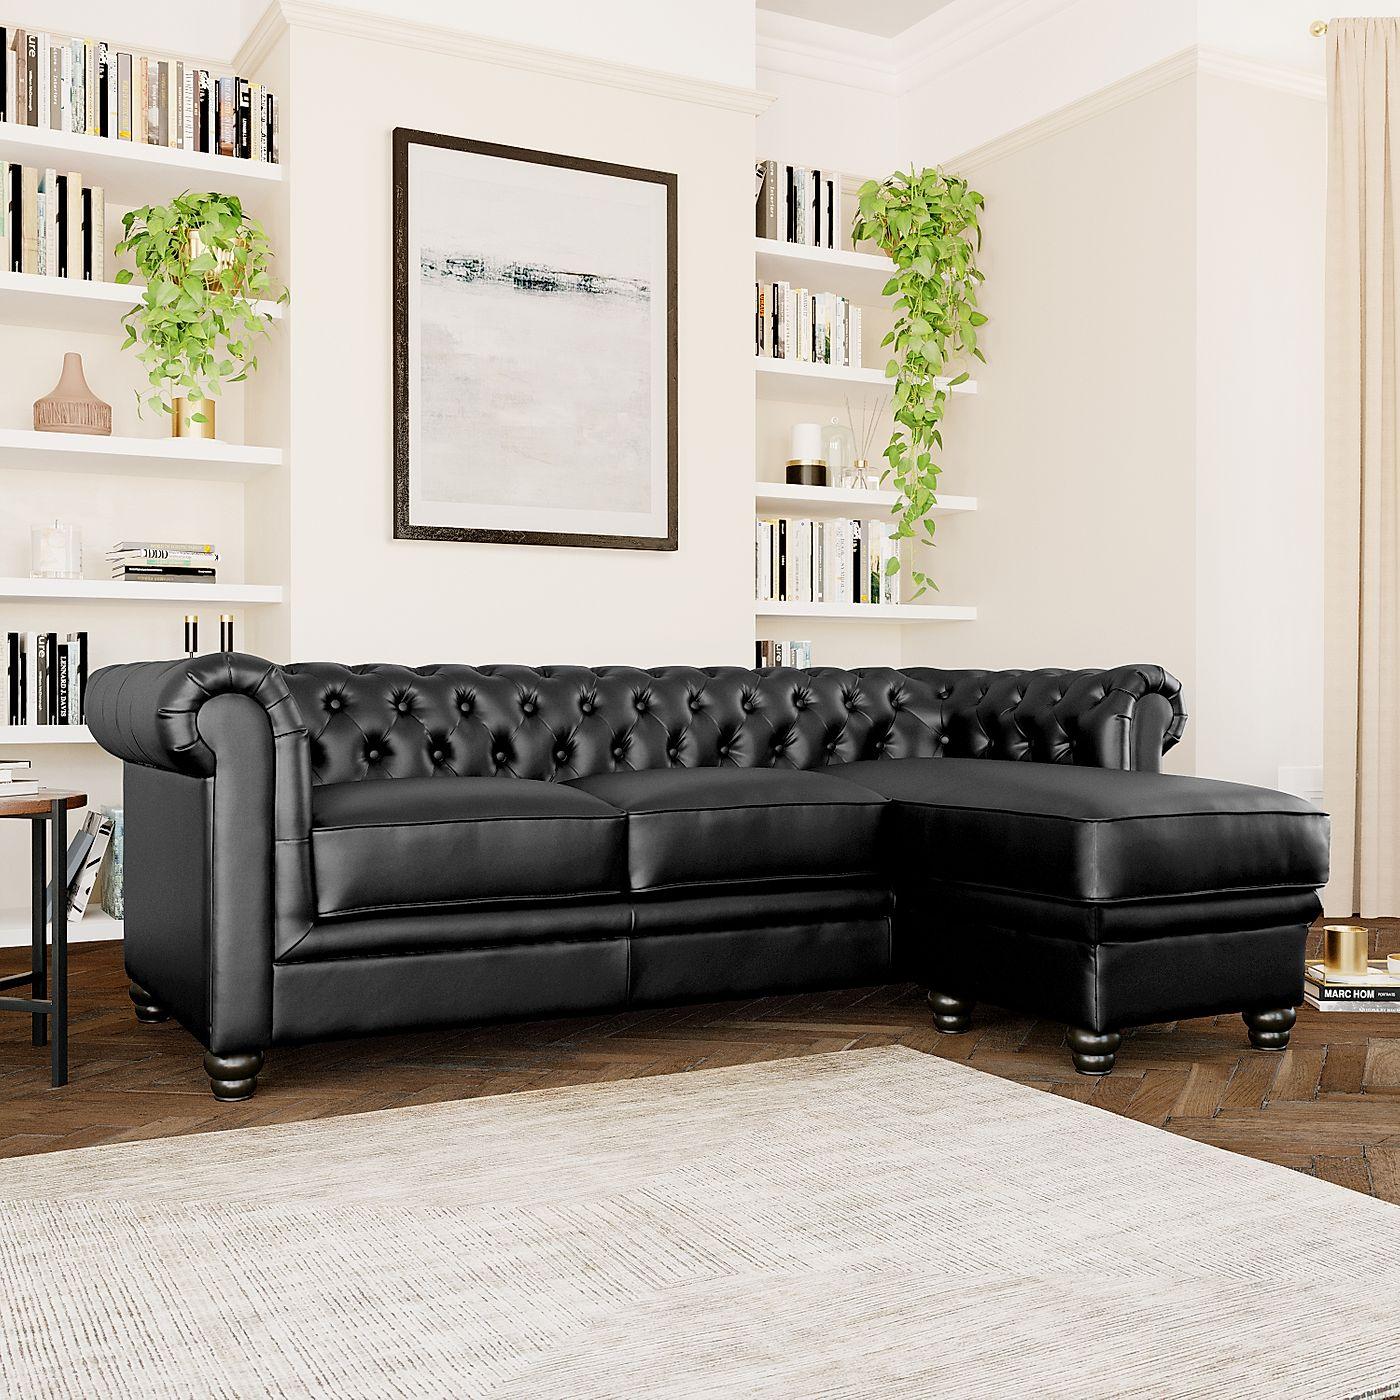 Hampton Black Leather L Shape Chesterfield Corner Sofa With Regard To Leather Corner Sofas (View 4 of 15)